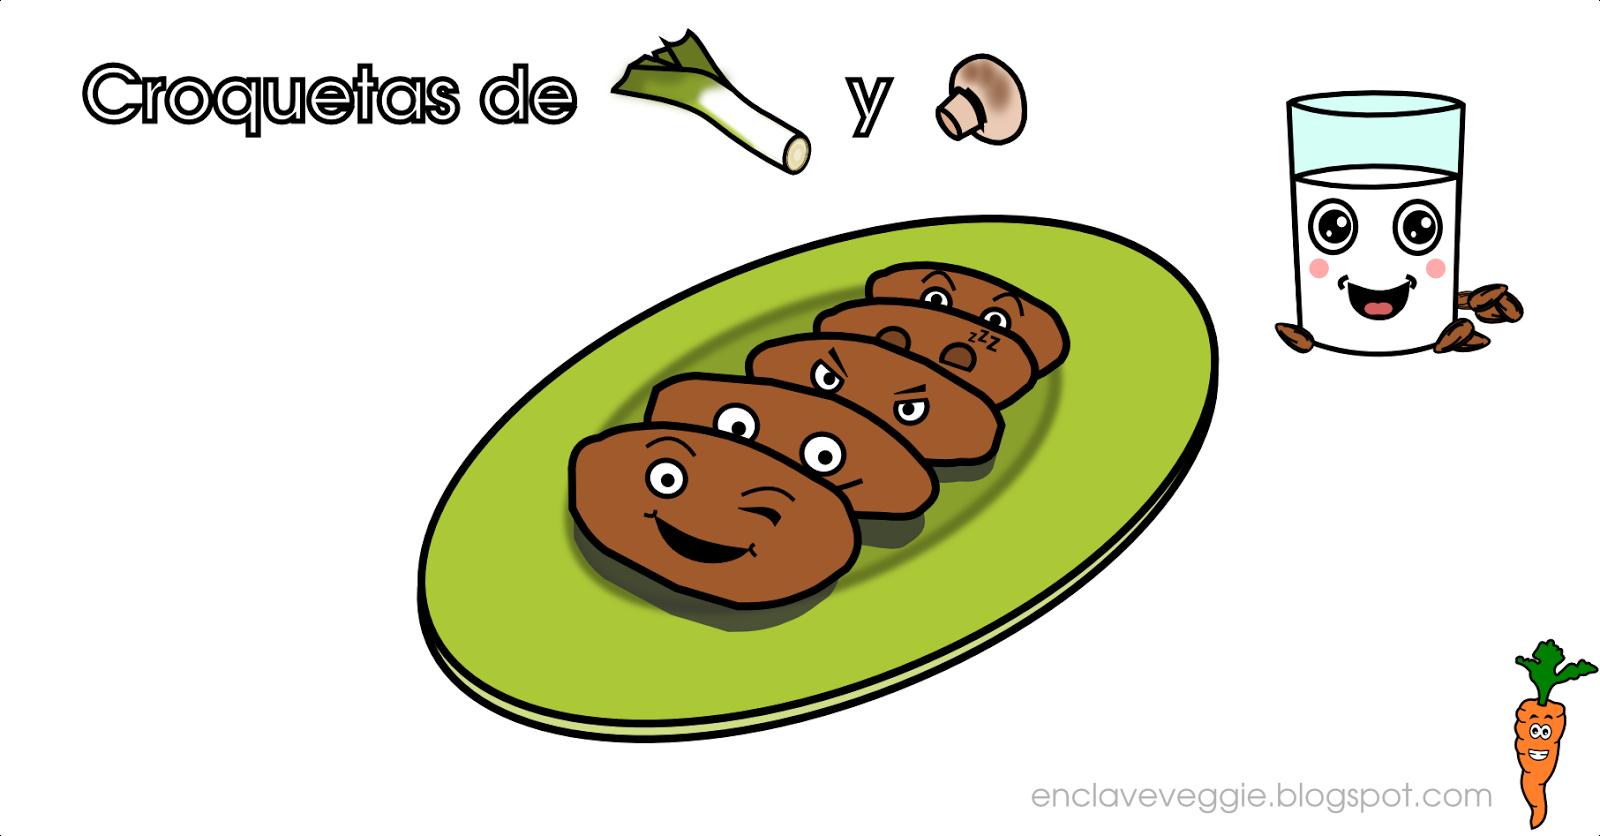 http://enclaveveggie.blogspot.com/2014/11/croquetas-veganas-de-puerro-y.html